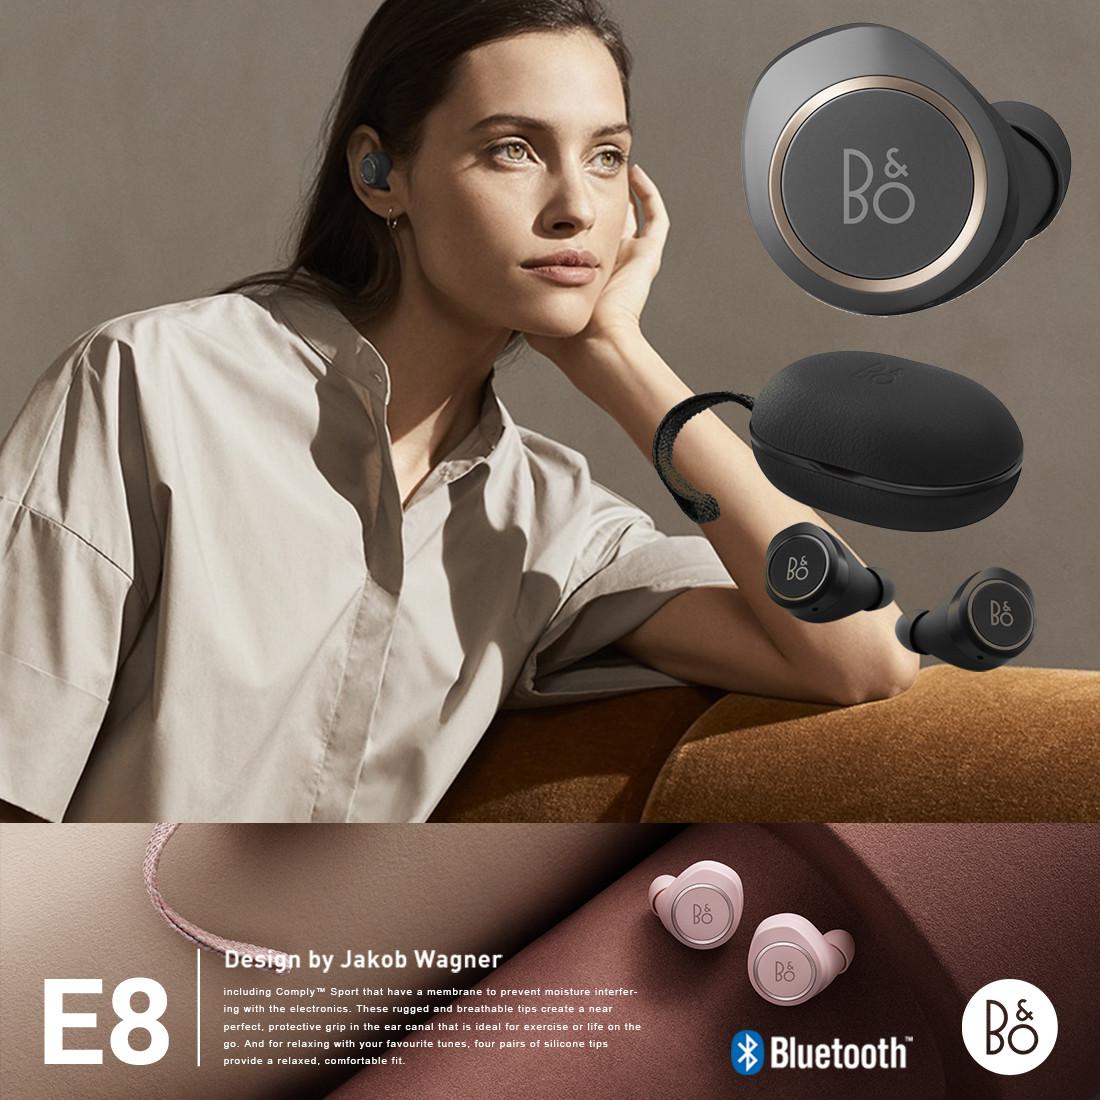 【B&O Play】Beoplay E8 ワイヤレスイヤフォンヤコブ・ワグナー/リチウムイオン電池/ハンズフリー通話/Bluetooth 4.2/ブルートゥース/密閉型/持ち運び/高音質【コンビニ受取対応商品】